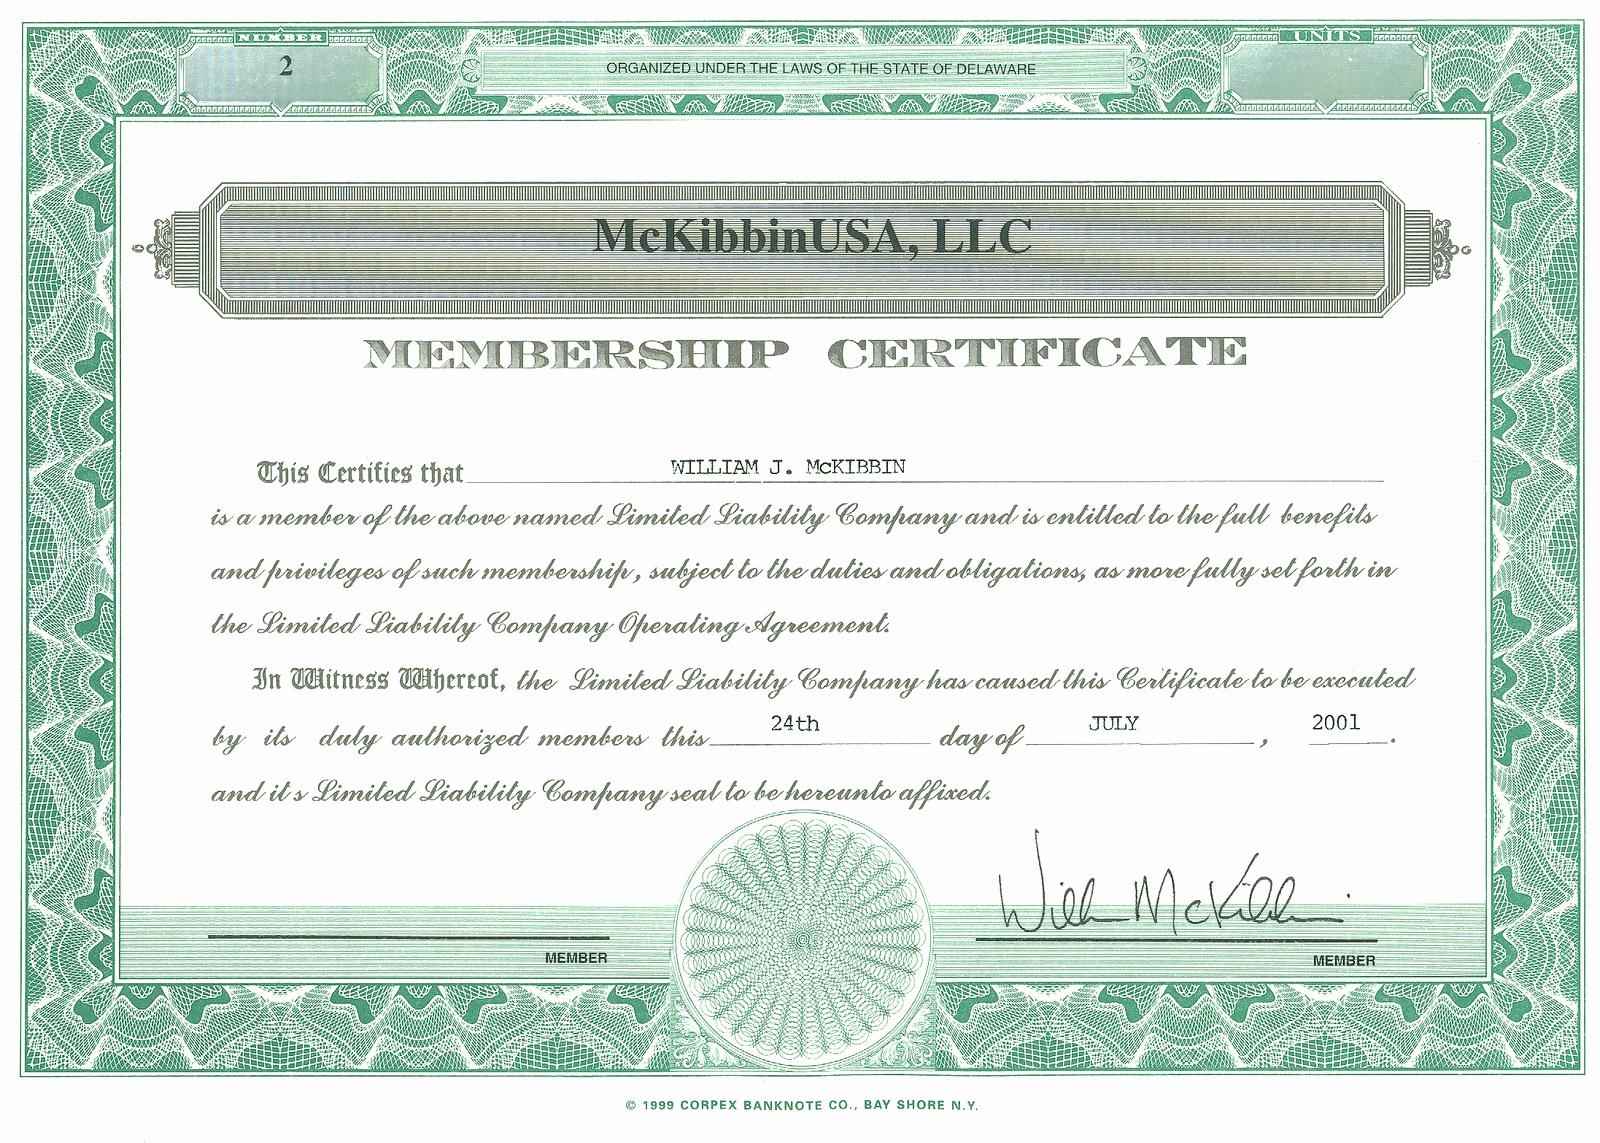 Llc Member Certificate Template Elegant the Vantage Point August 2010